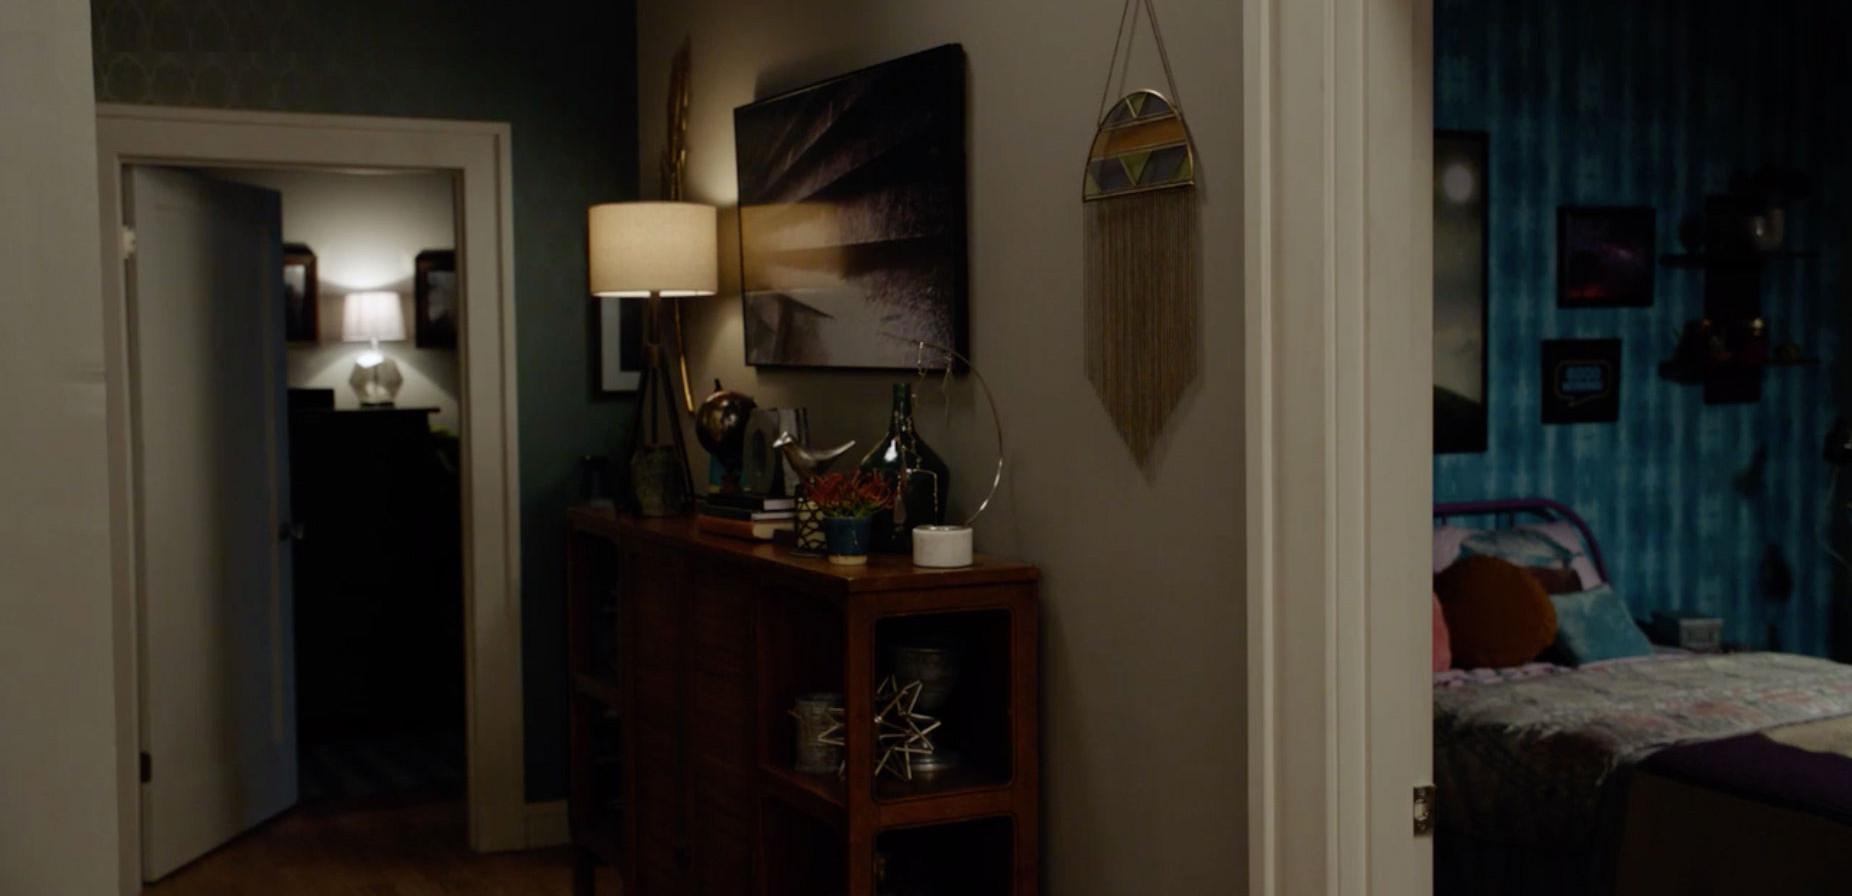 Hallway-at-night.jpg